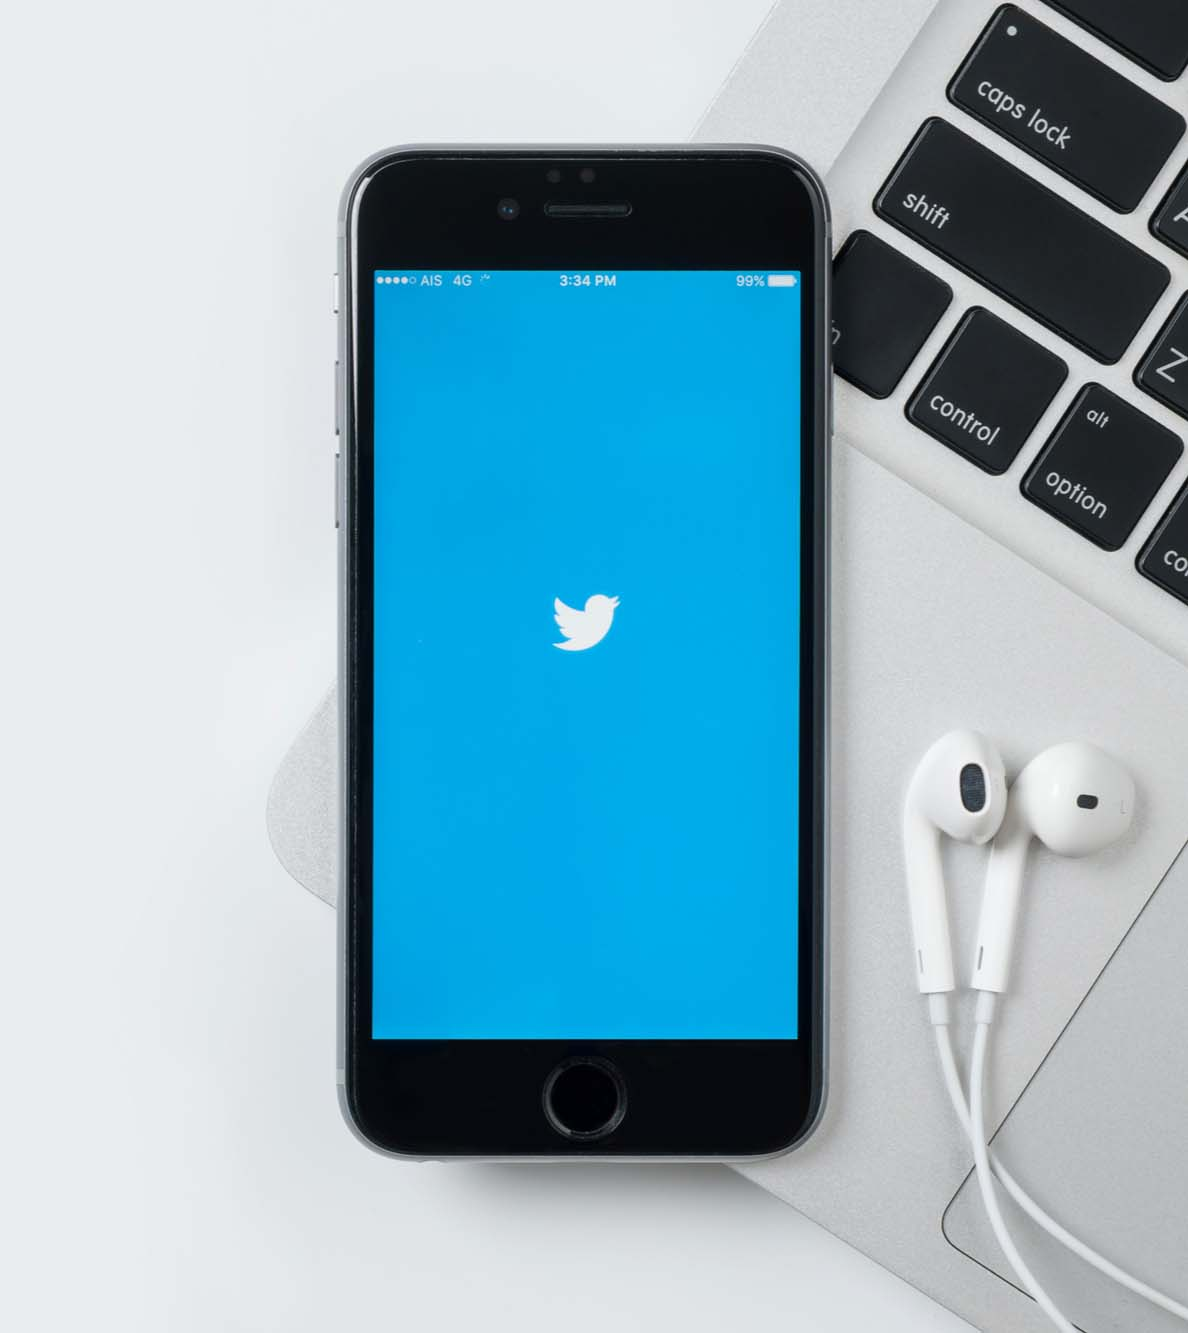 twitter iphone © ArthurStock / Shutterstock.com